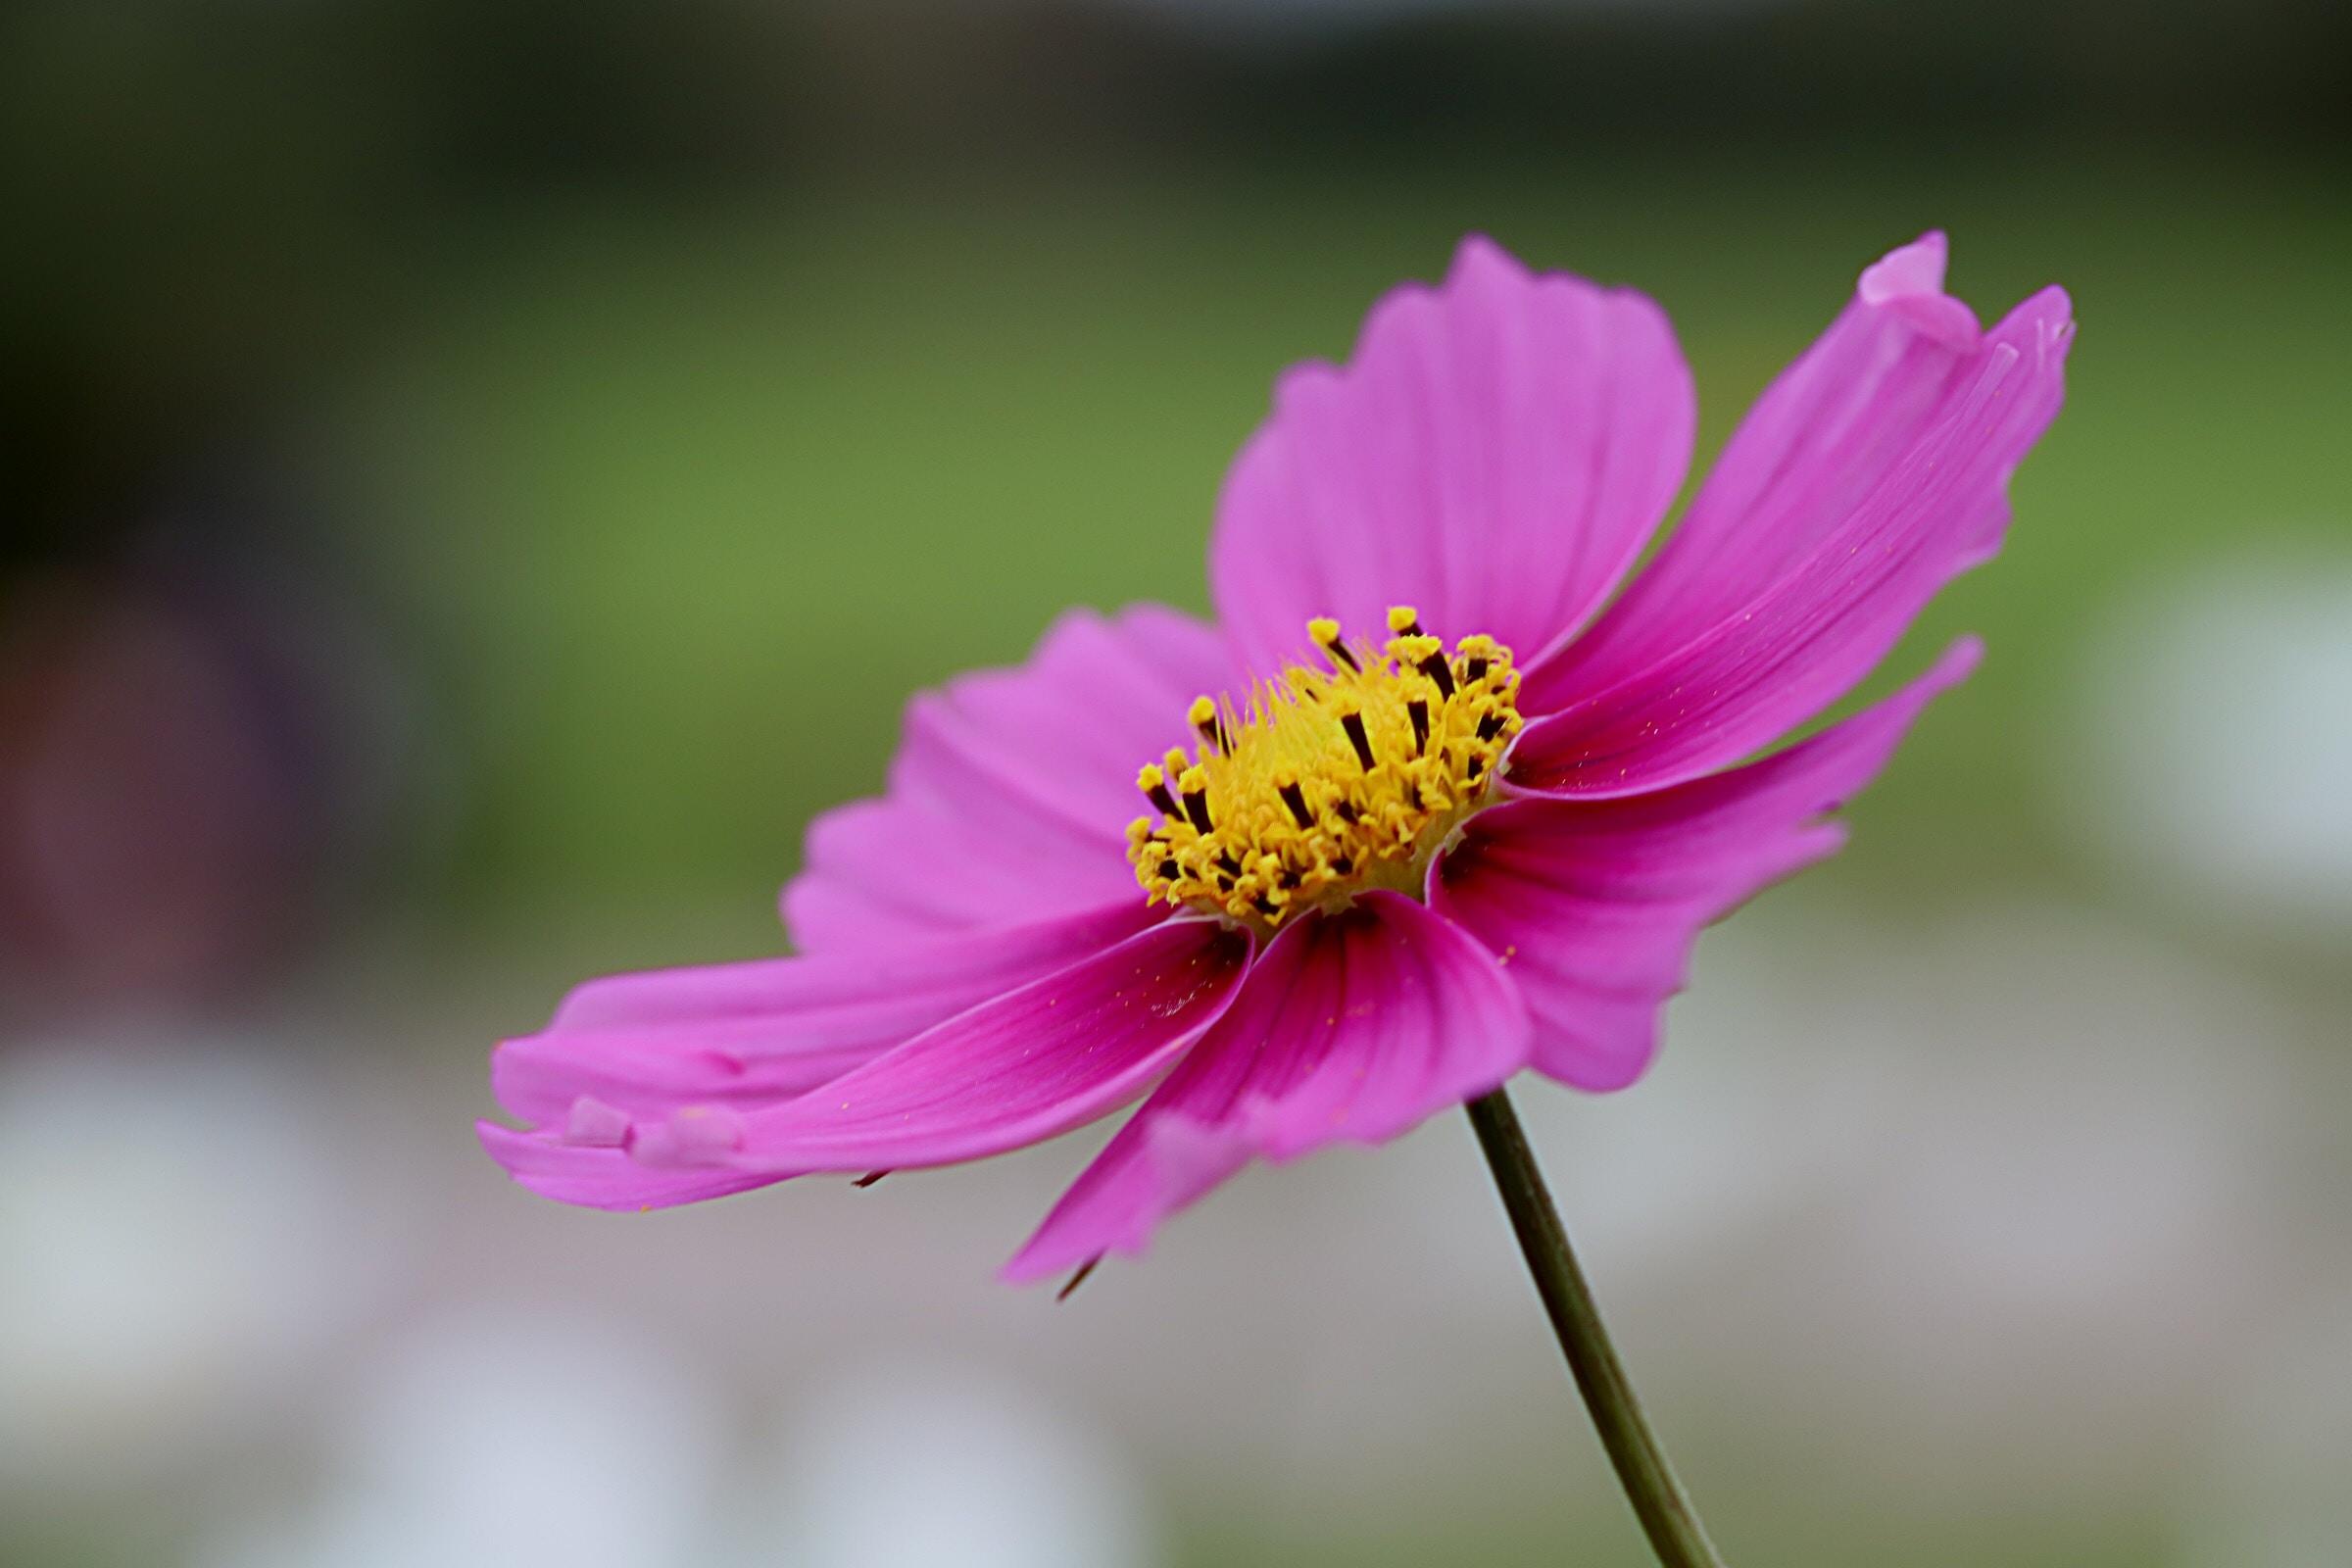 closeup photo of purple petaled flower